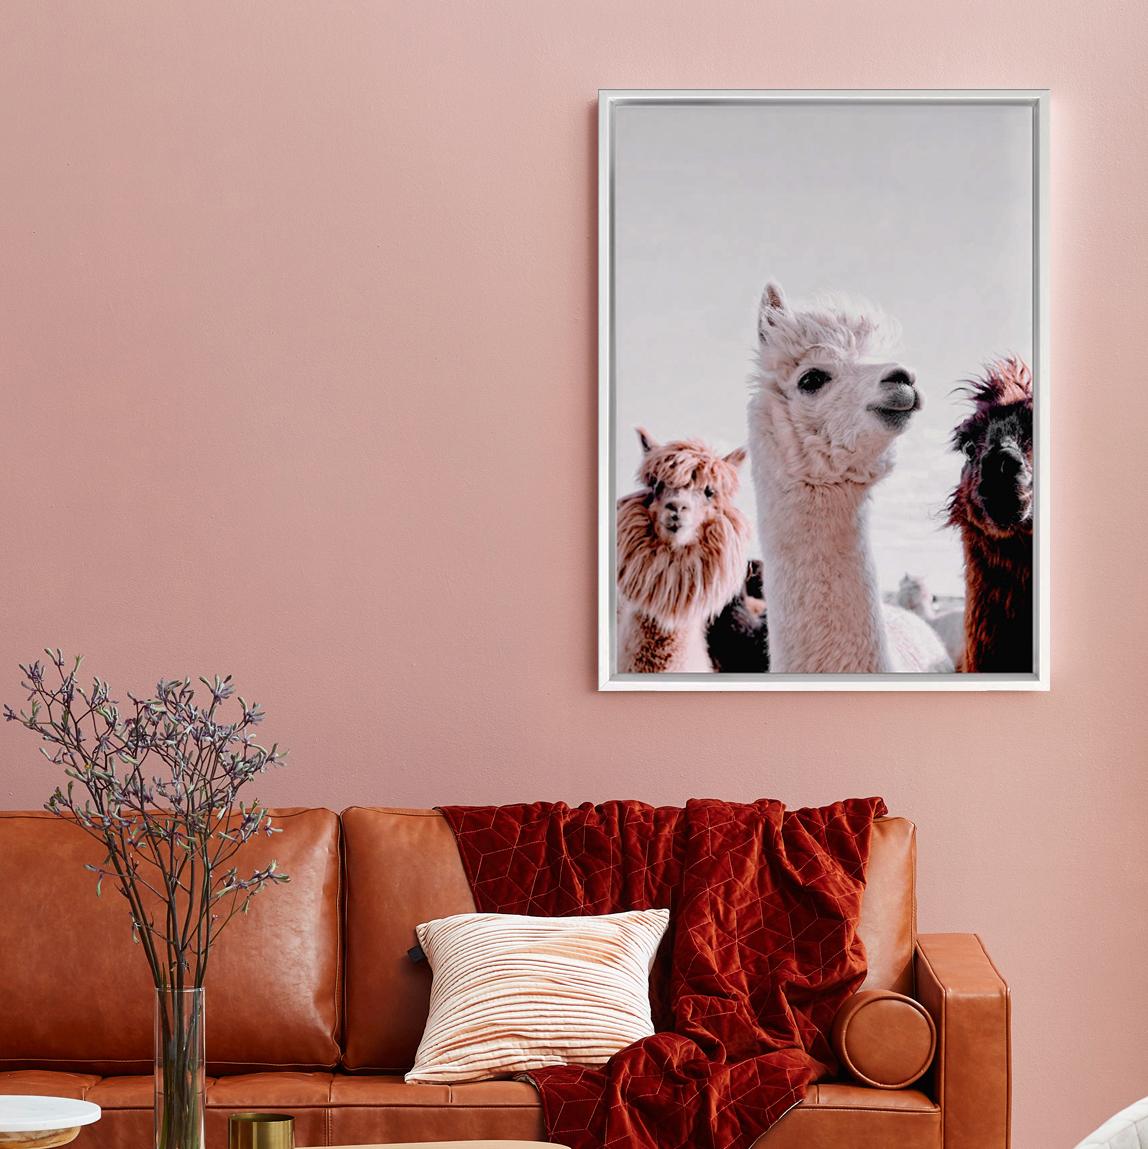 Llama No Problems Picture CANVAS WALL ART Portrait Print Grey